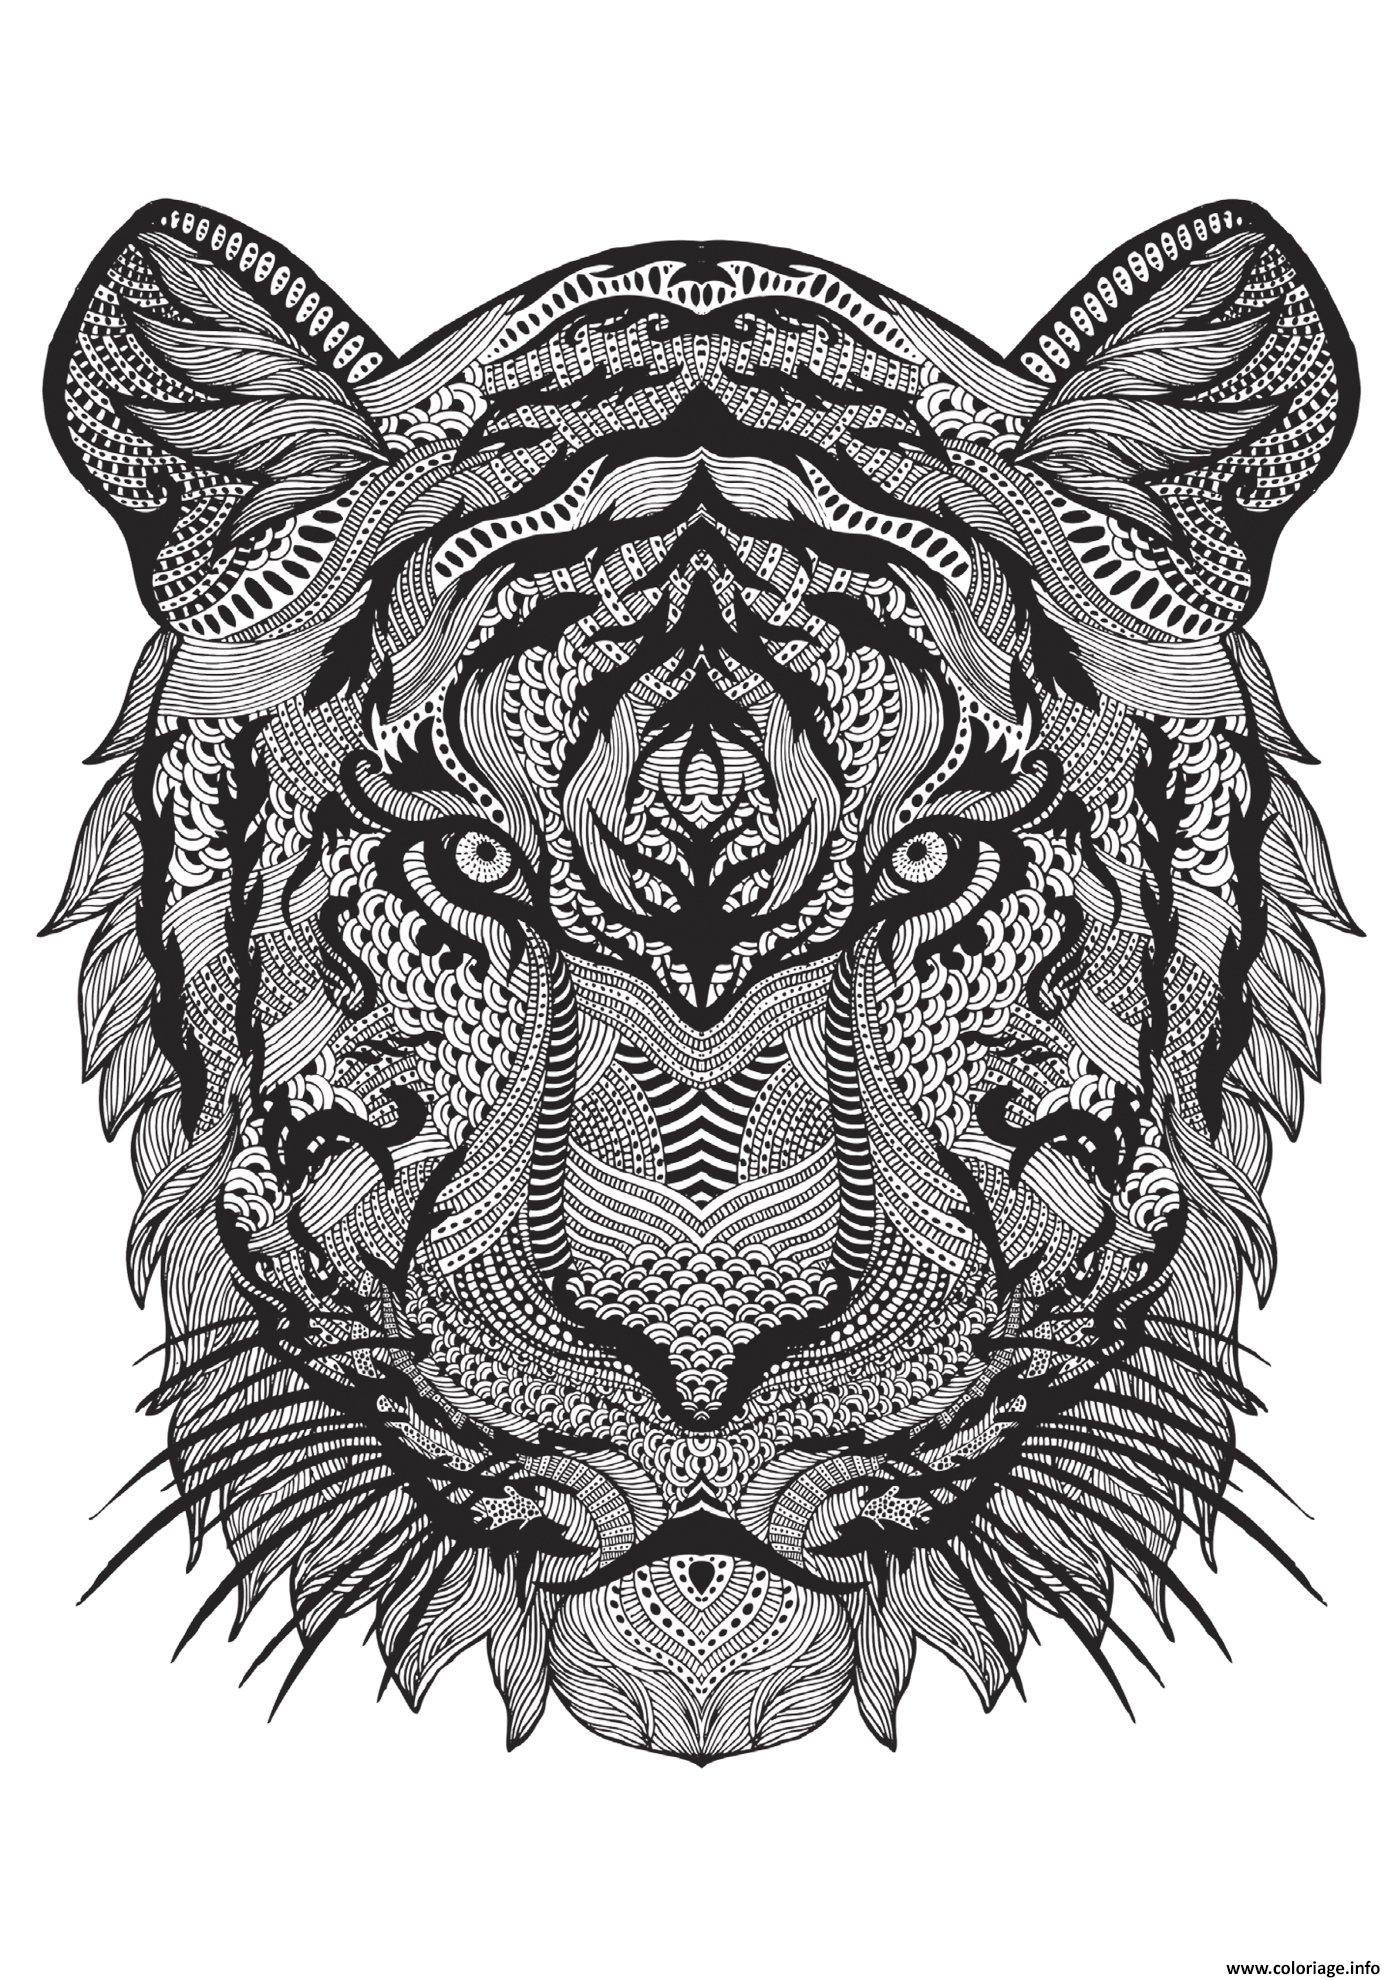 Coloriage Adulte Animal Tigre Difficile Antistress Dessin